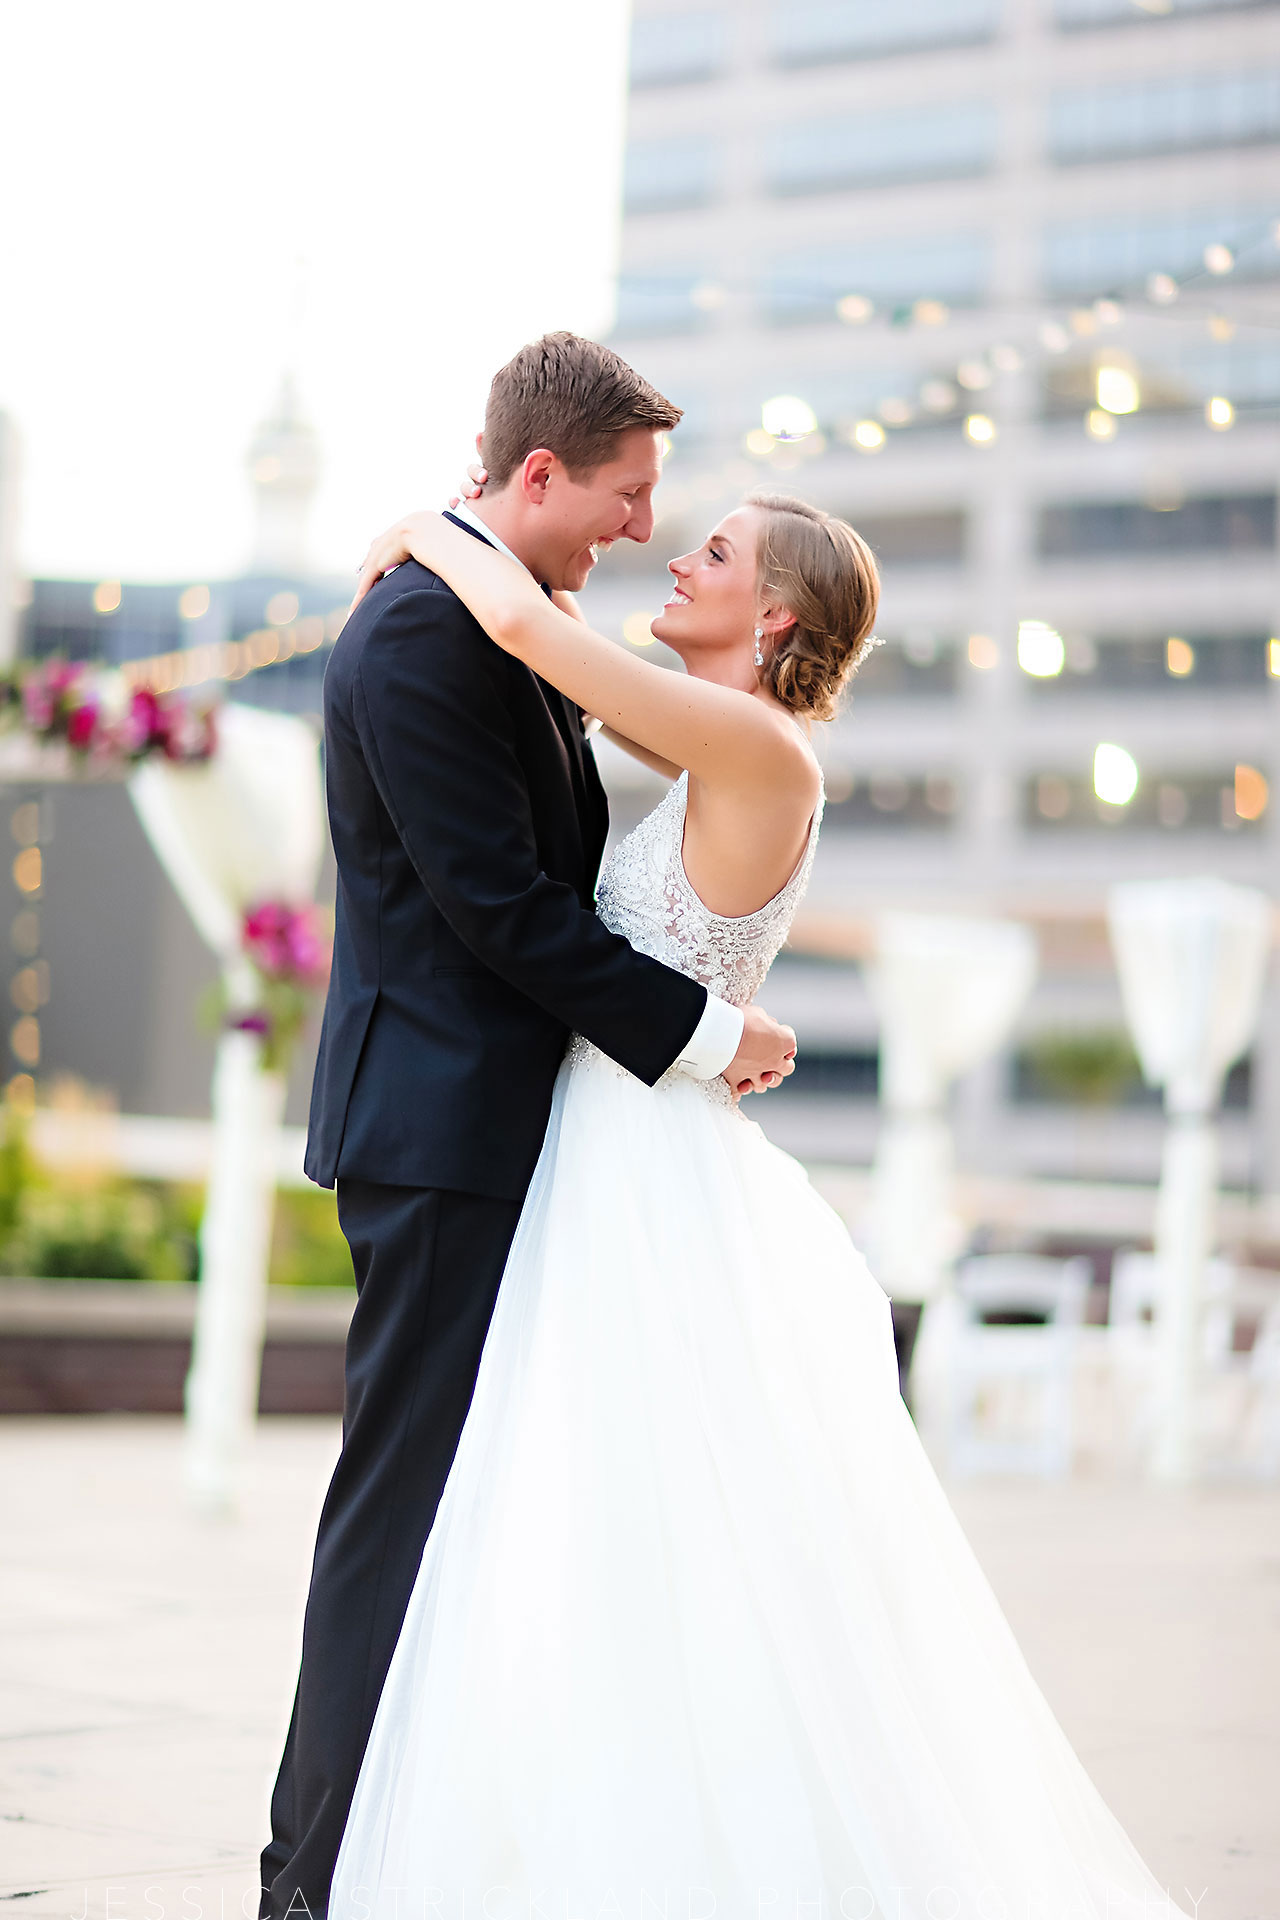 Serra Alex Regions Tower Indianapolis Wedding 337 watermarked